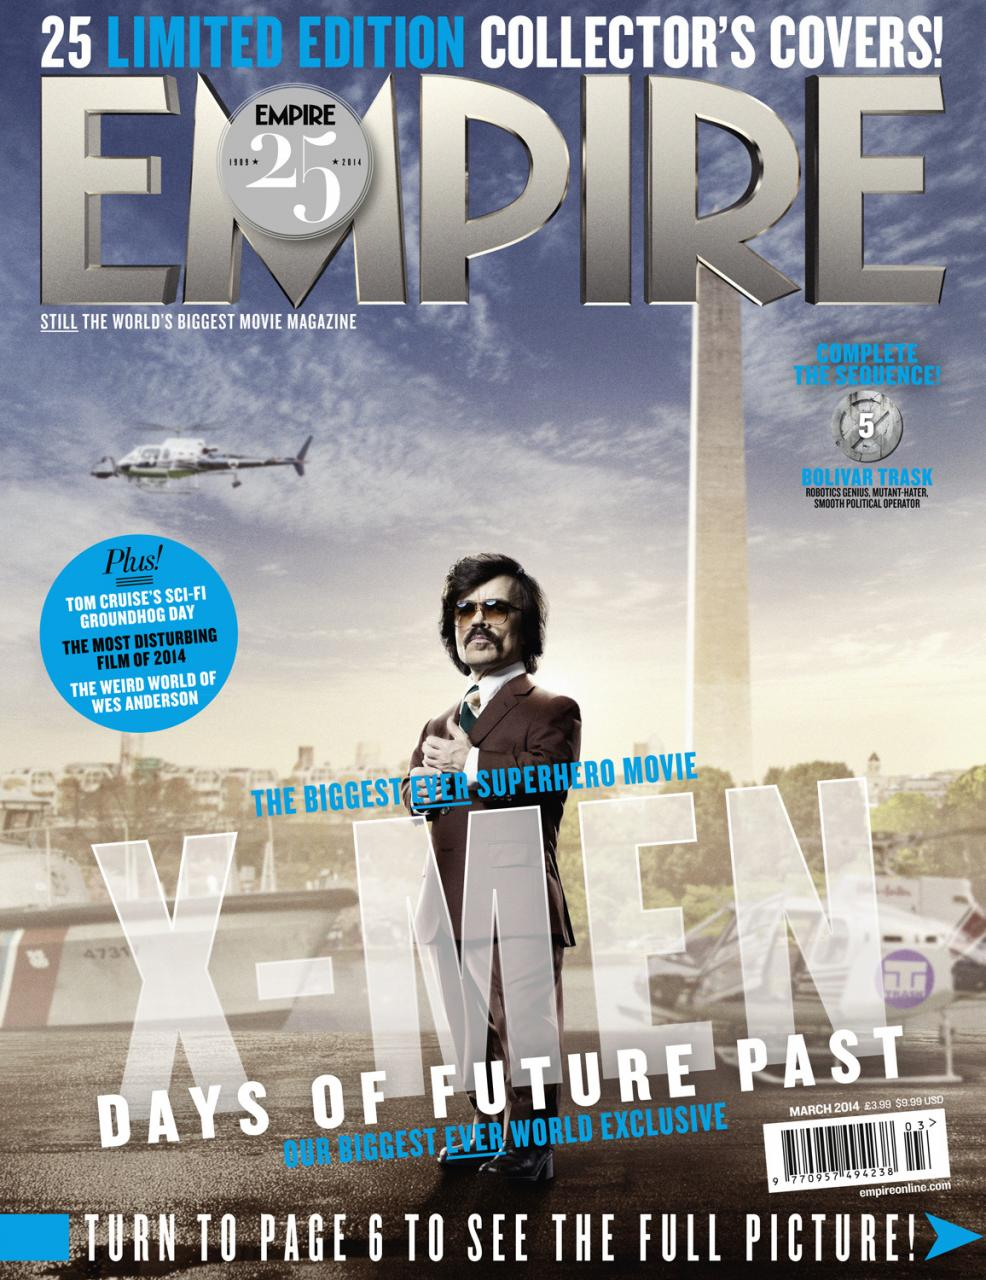 hr_X-Men-_Days_of_Future_Past_59.jpg